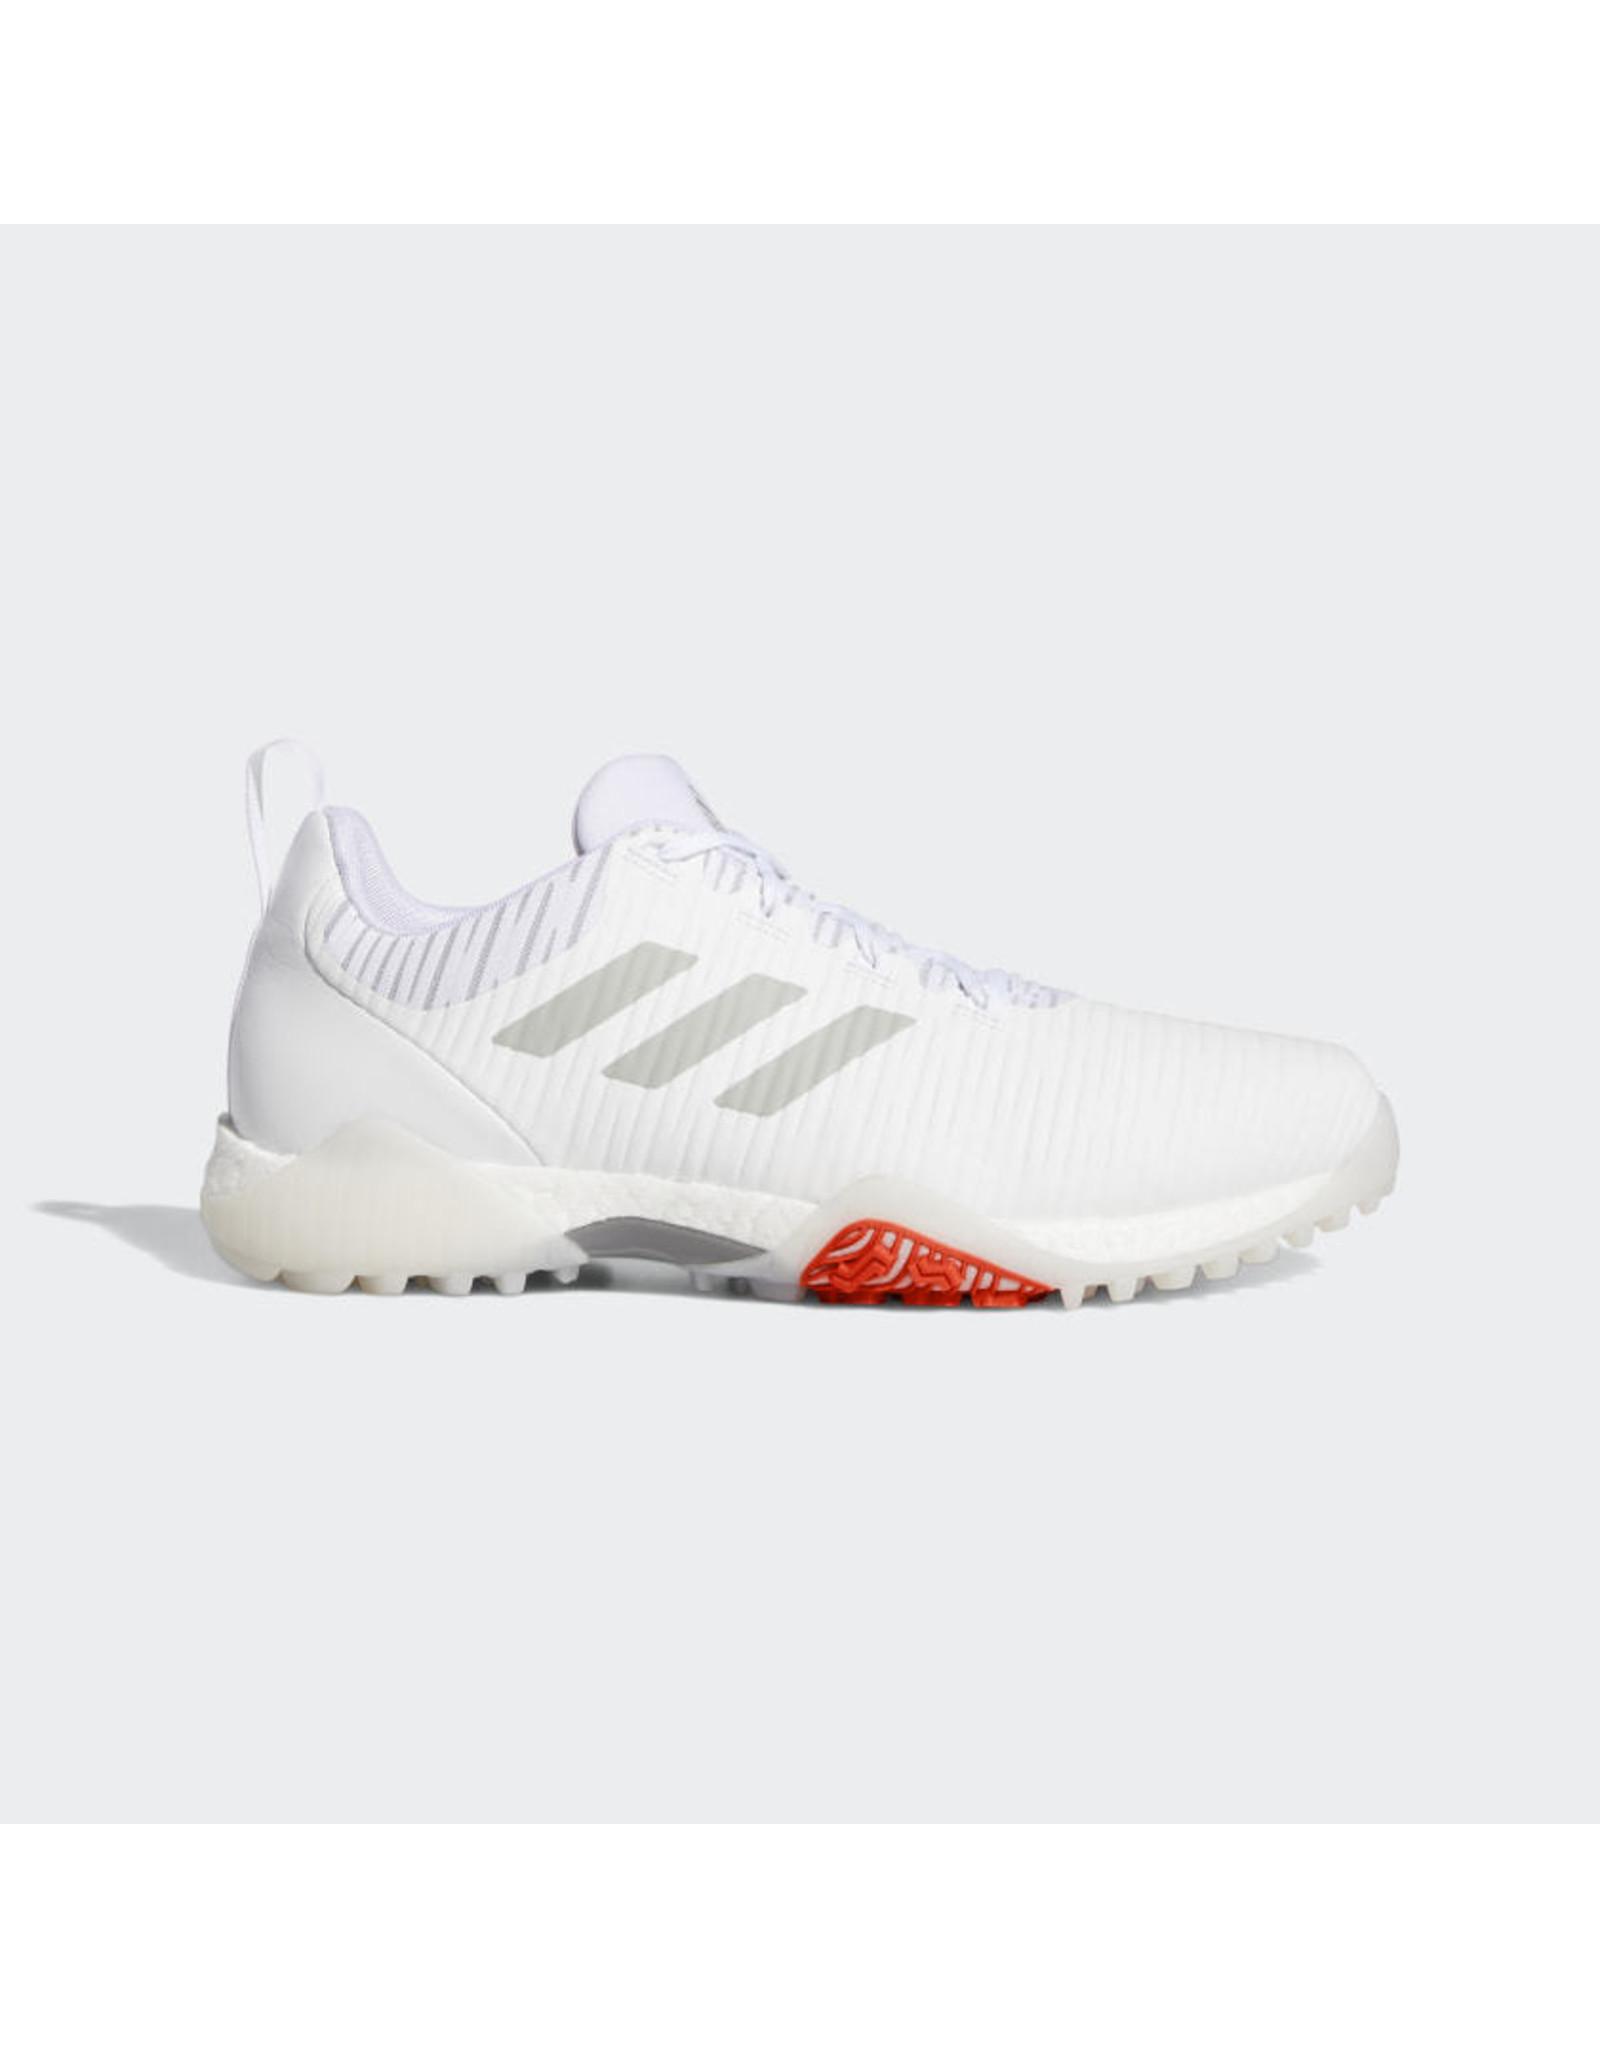 Adidas Adidas CodeChaos White